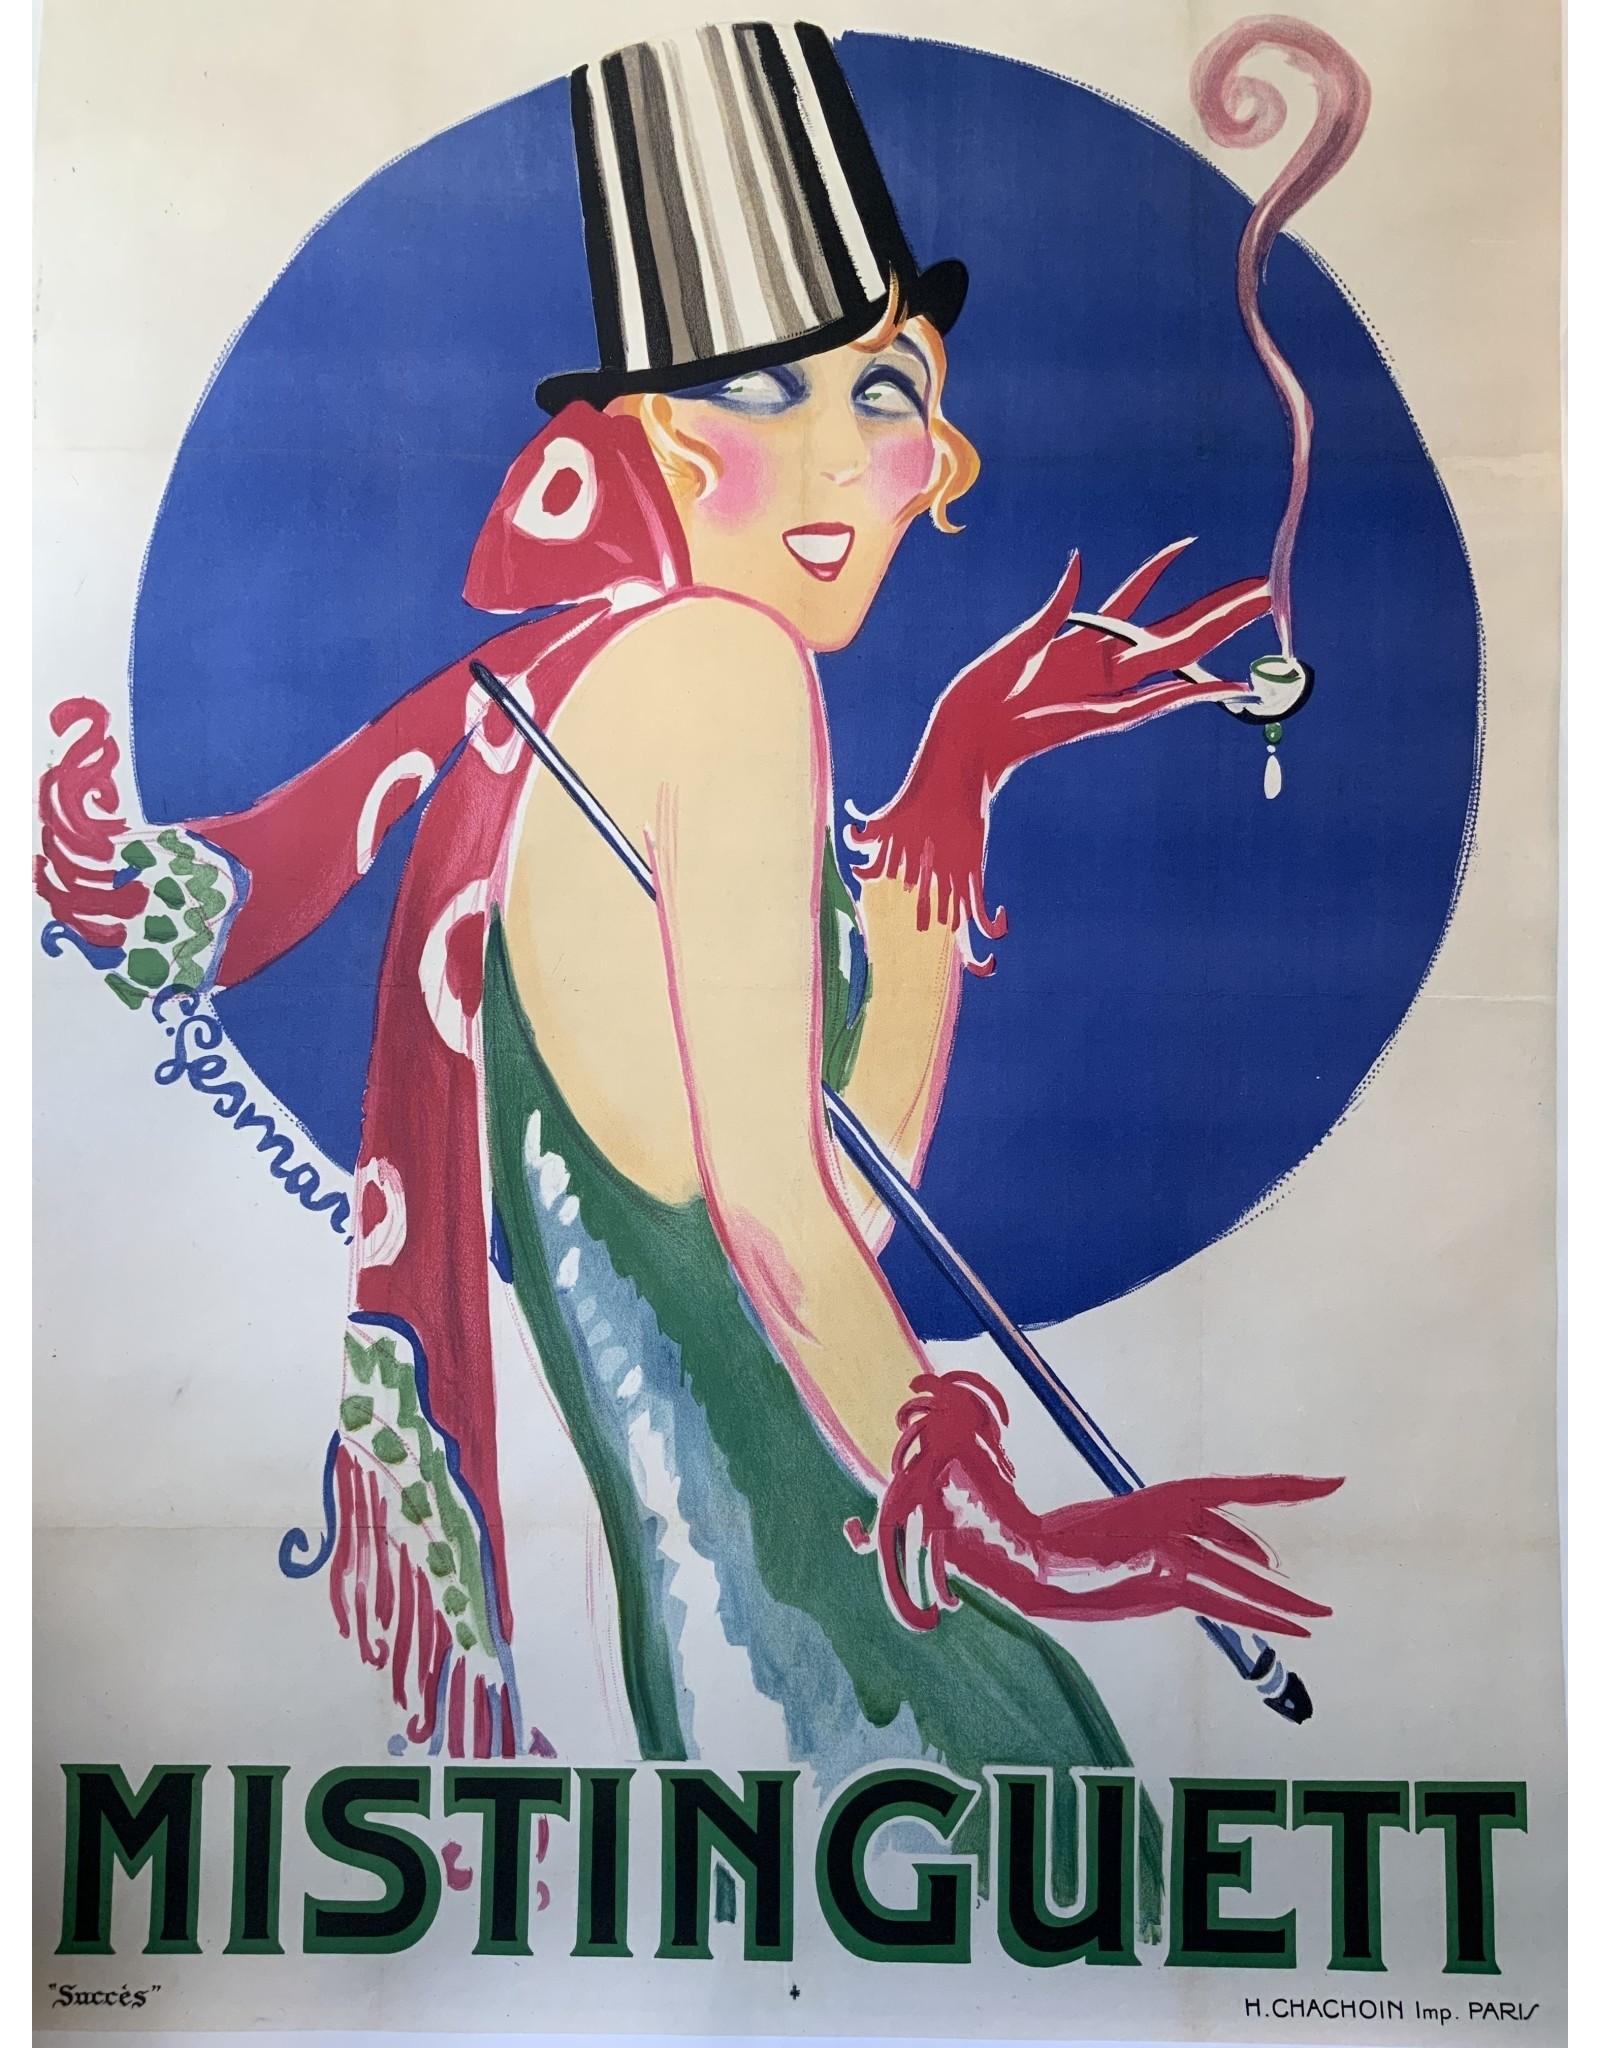 SPV Mistinguett with top hat